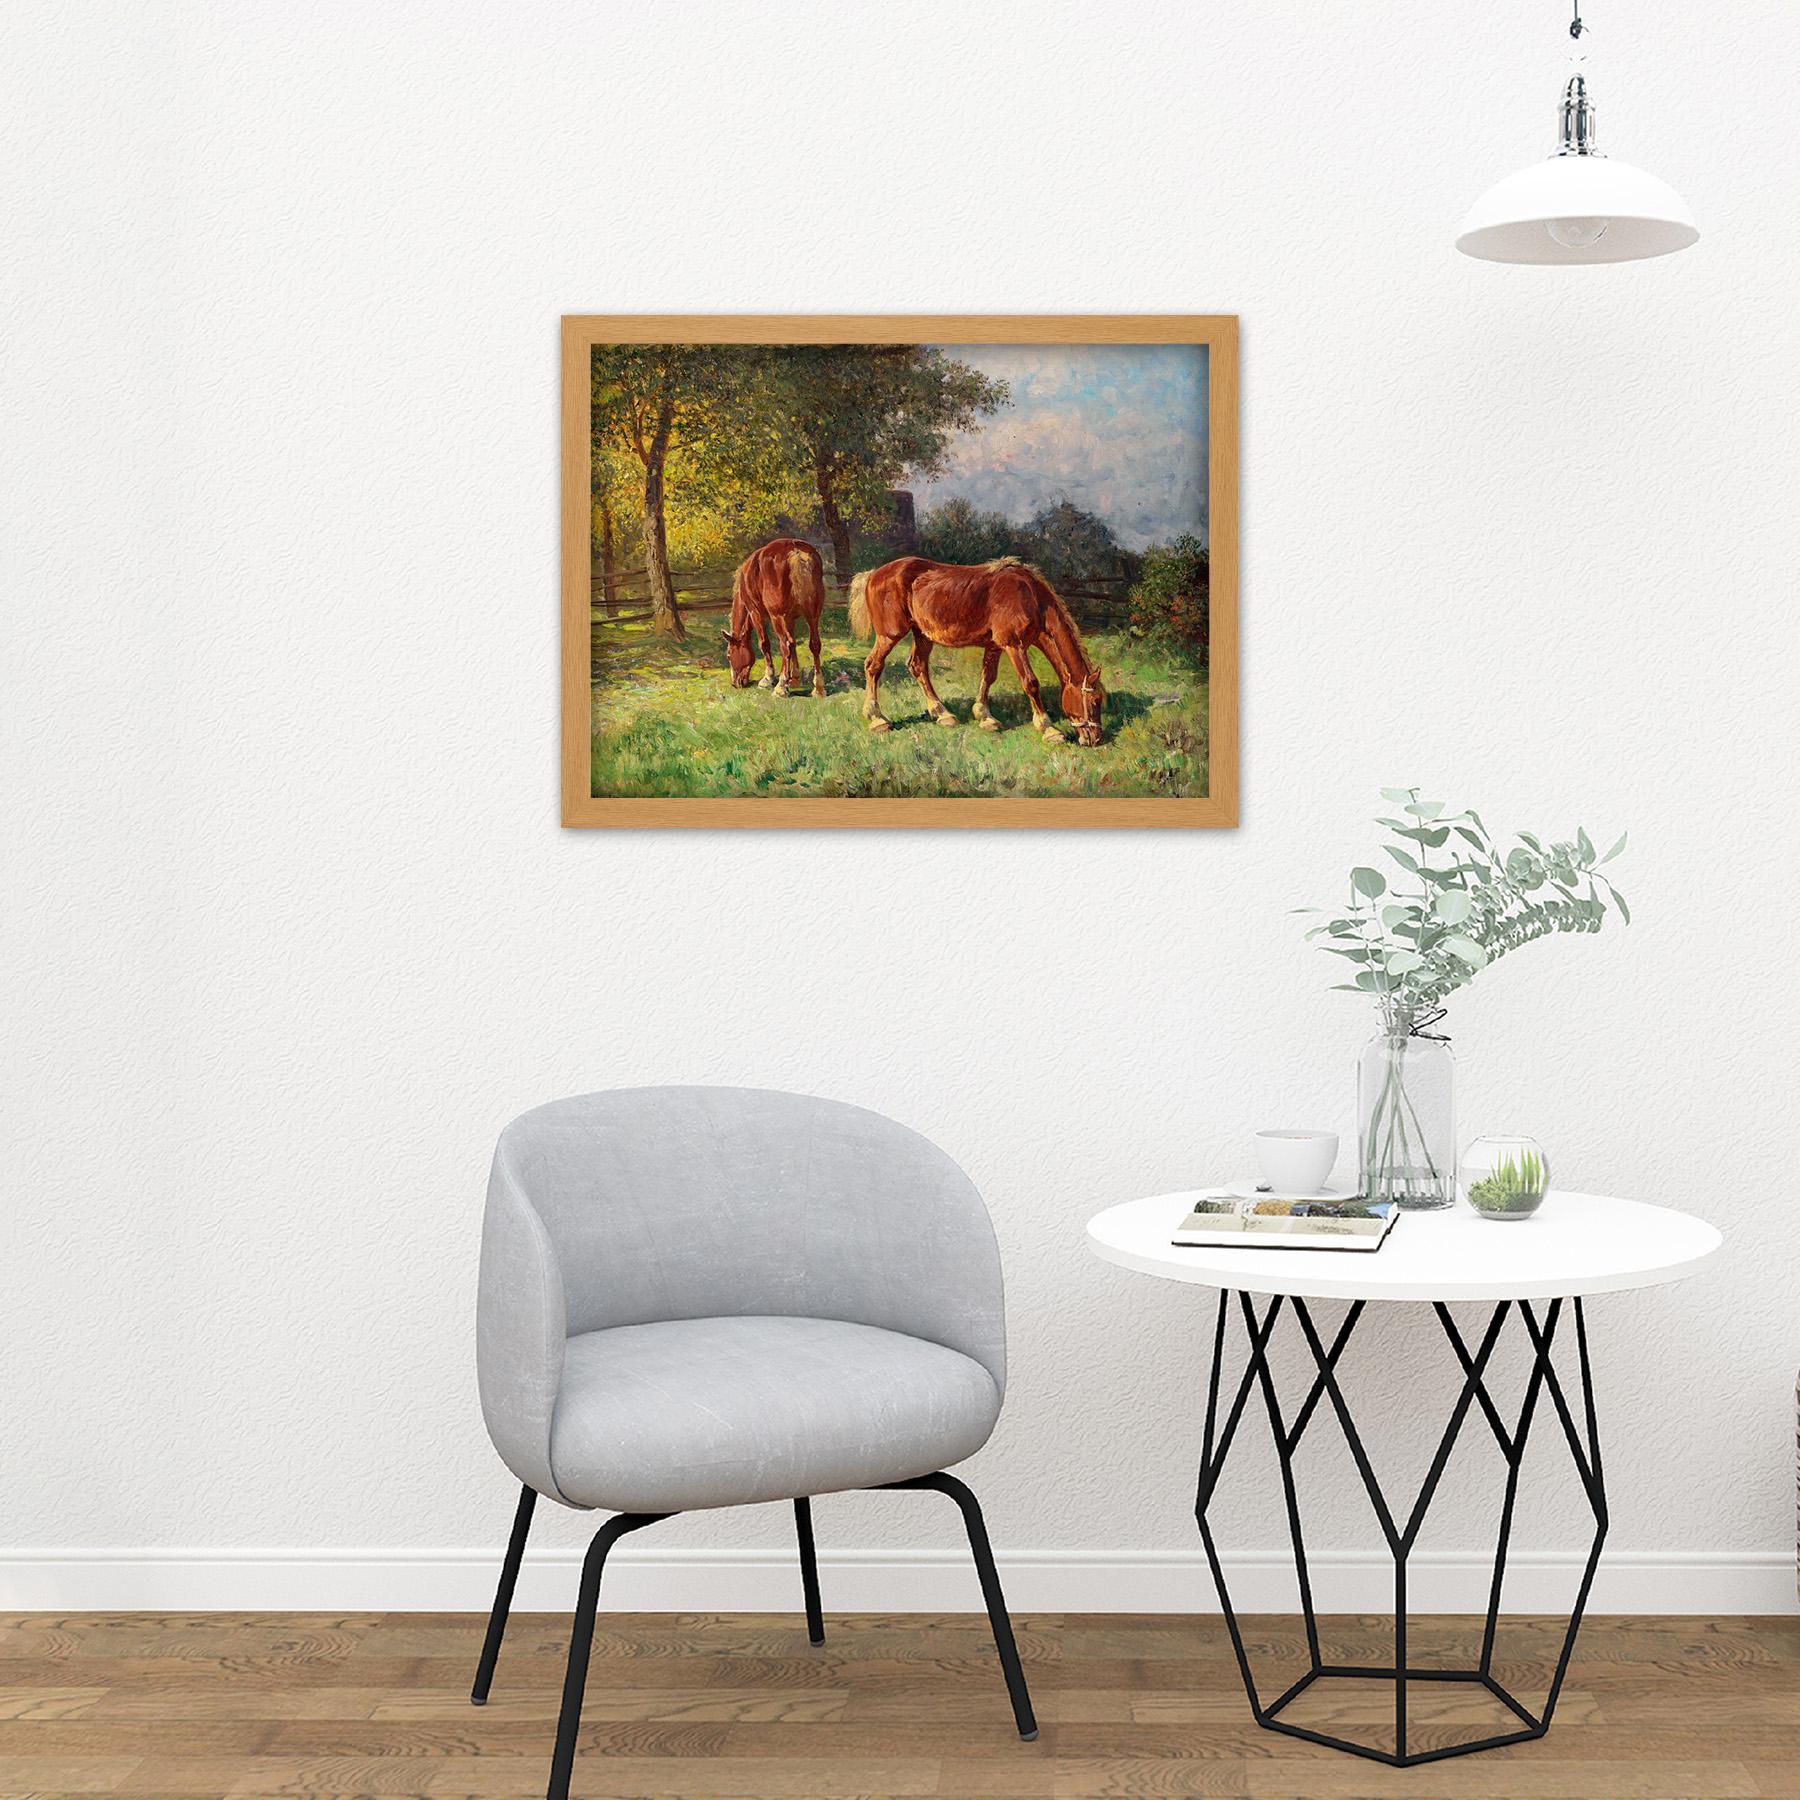 Van-Der-Venne-Horses-In-Pasture-Painting-Large-Framed-Art-Print thumbnail 18